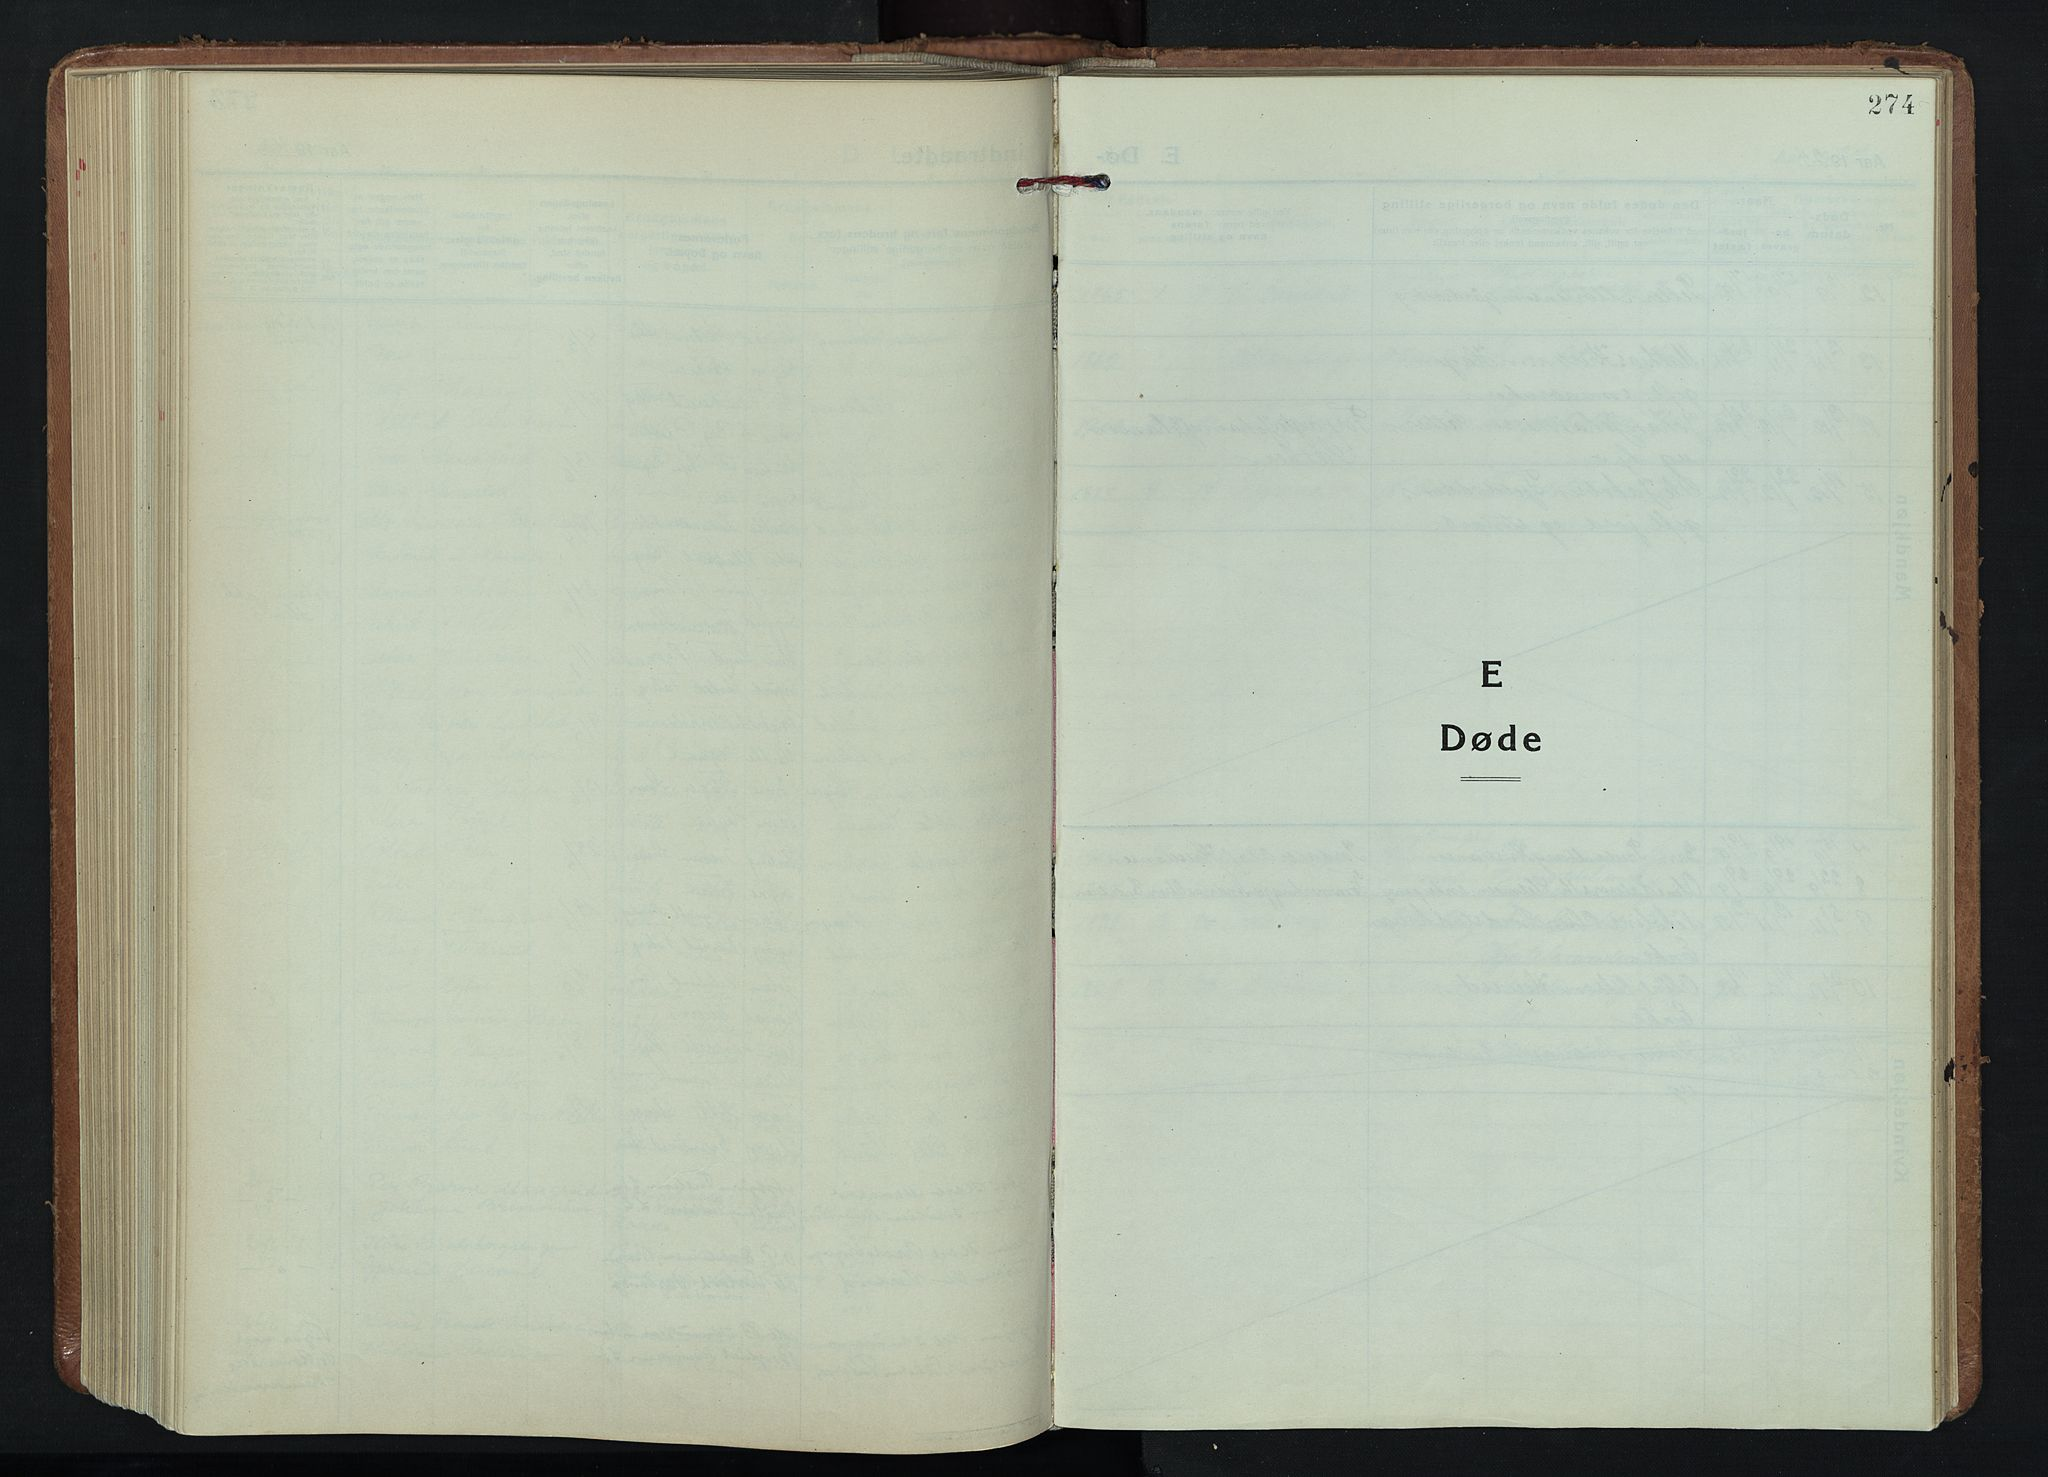 SAH, Fåberg prestekontor, H/Ha/Hab/L0015: Klokkerbok nr. 15, 1924-1949, s. 274